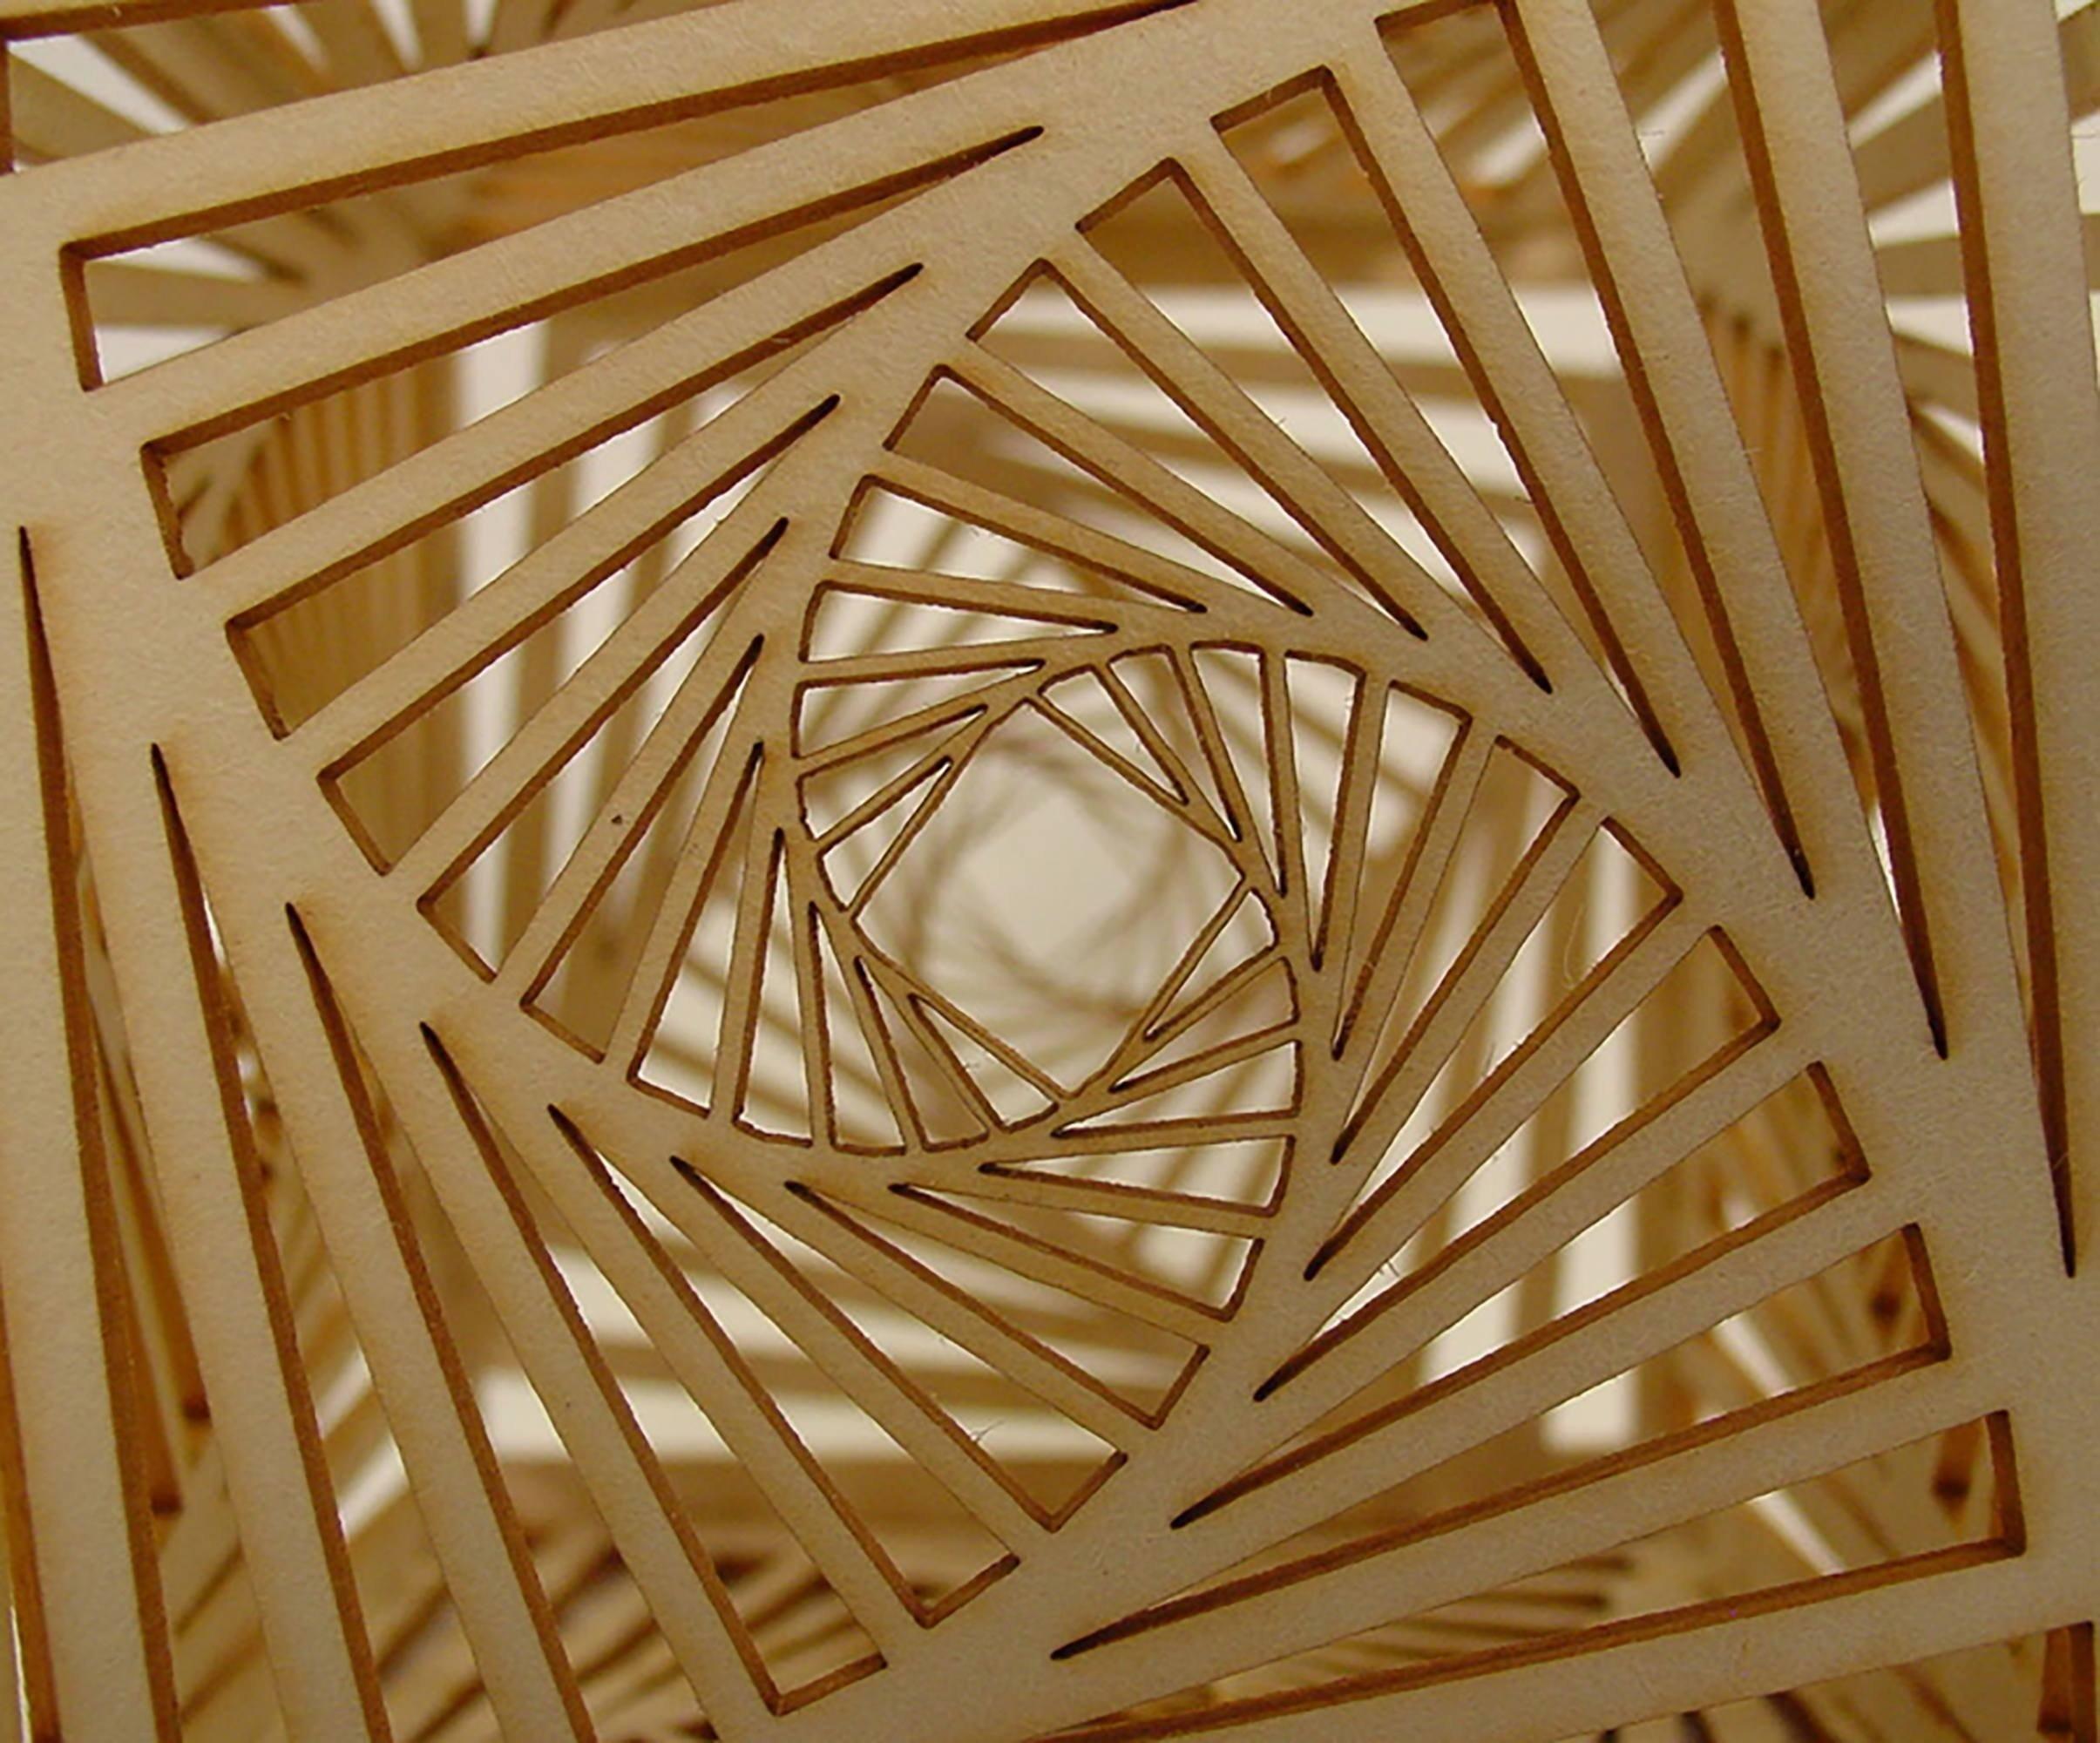 Laser cut cnc cardboard pattern